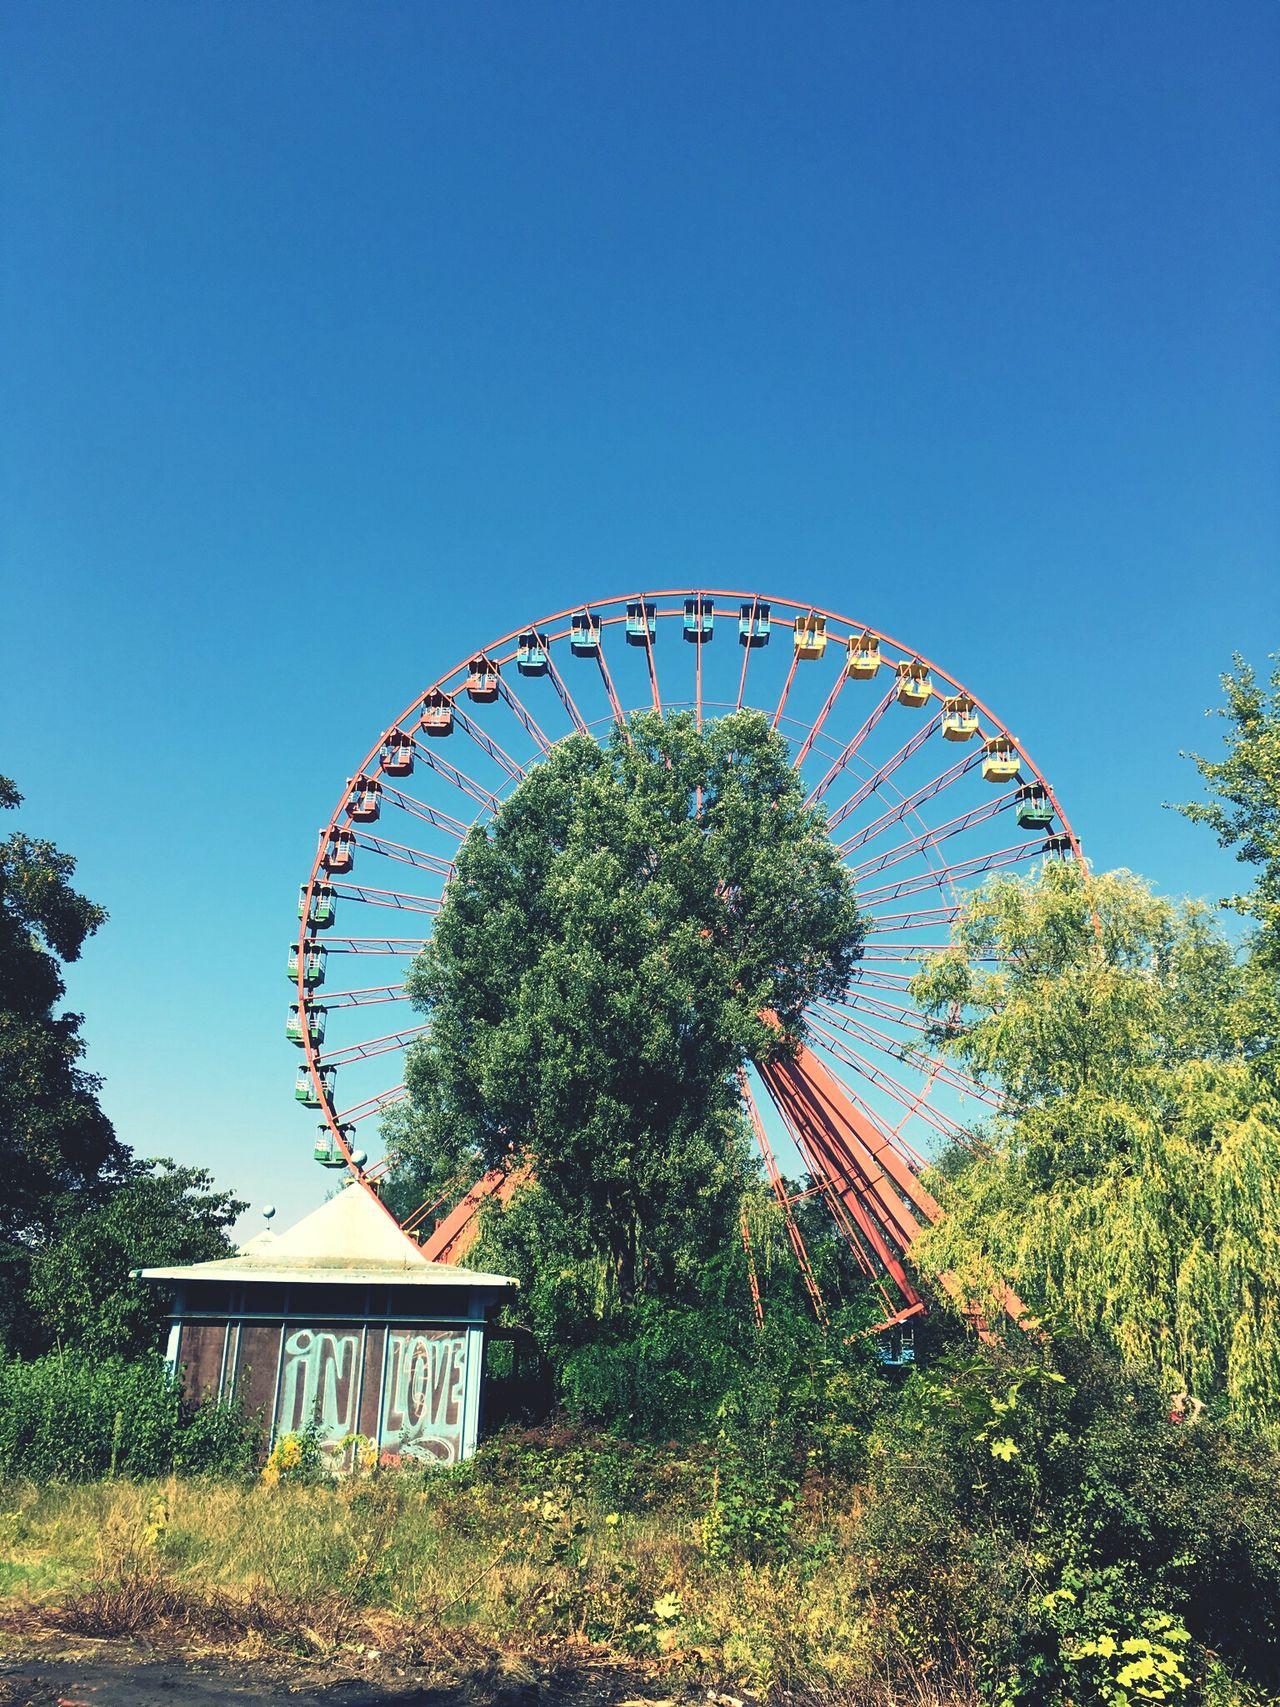 Berlin Spreepark Plänterwald Abandoned Themepark Ferris Wheel Urbex